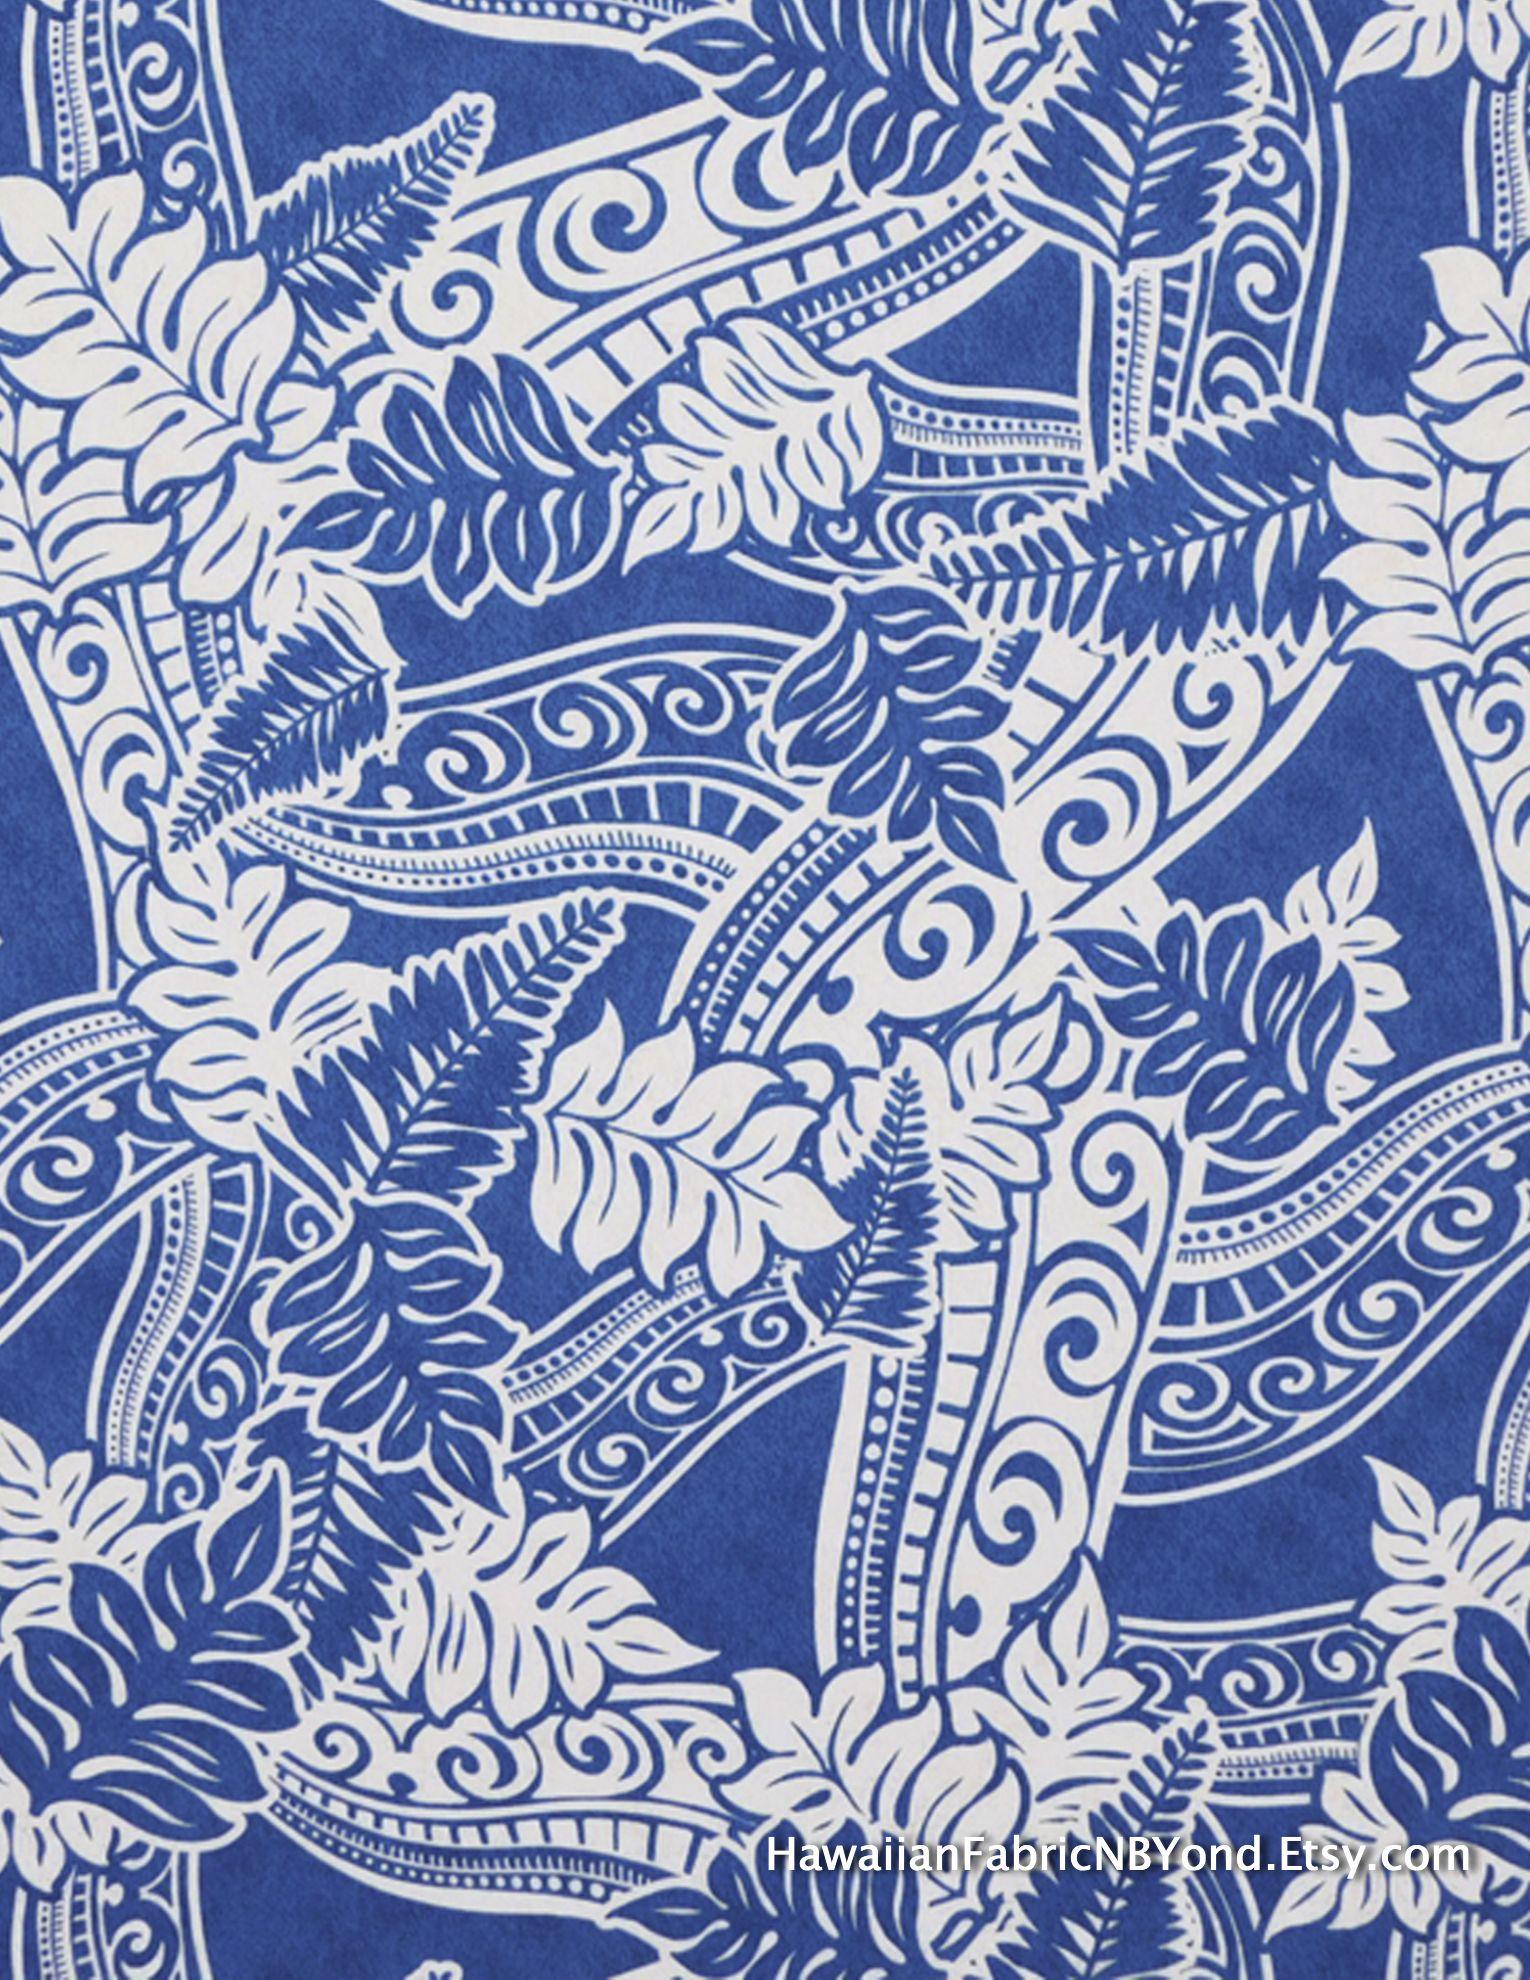 15c41d6a Fabric: Polynesian tattoo and tapa patterns and tropical ferns. lavalava and  Aloha shirts fabric. By HawaiianFabricNBYond.Etsy.com